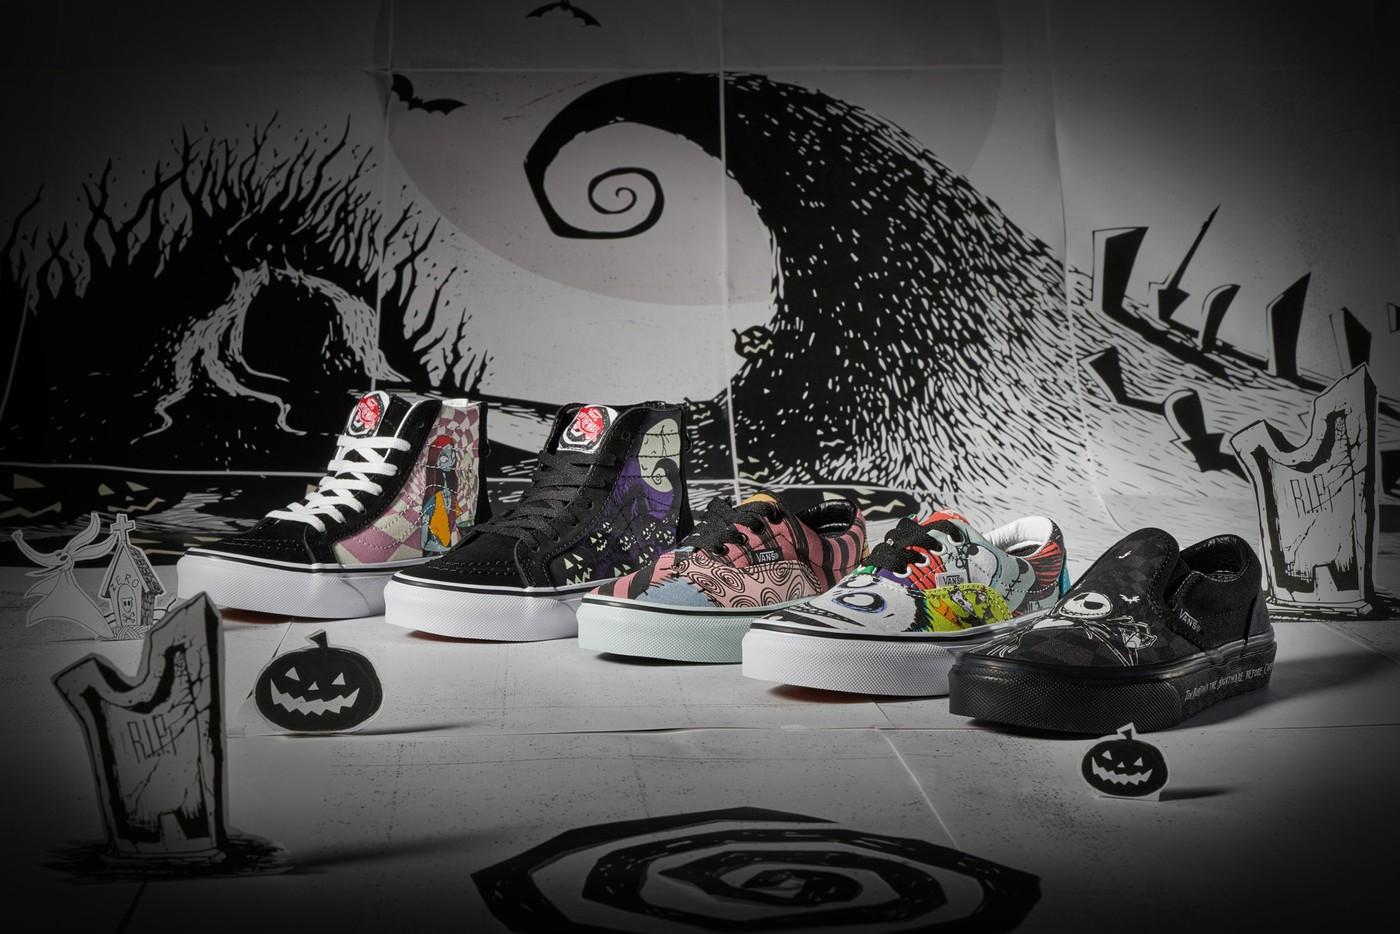 https hypebeast.com wp content blogs.dir 11 files 2019 10 vans disney collection sneakers l etrange noel de monsieur jack photos sortie 2 728x409 - Disney and Vans' The Nightmare Before Christmas shoe collection is spooky cool